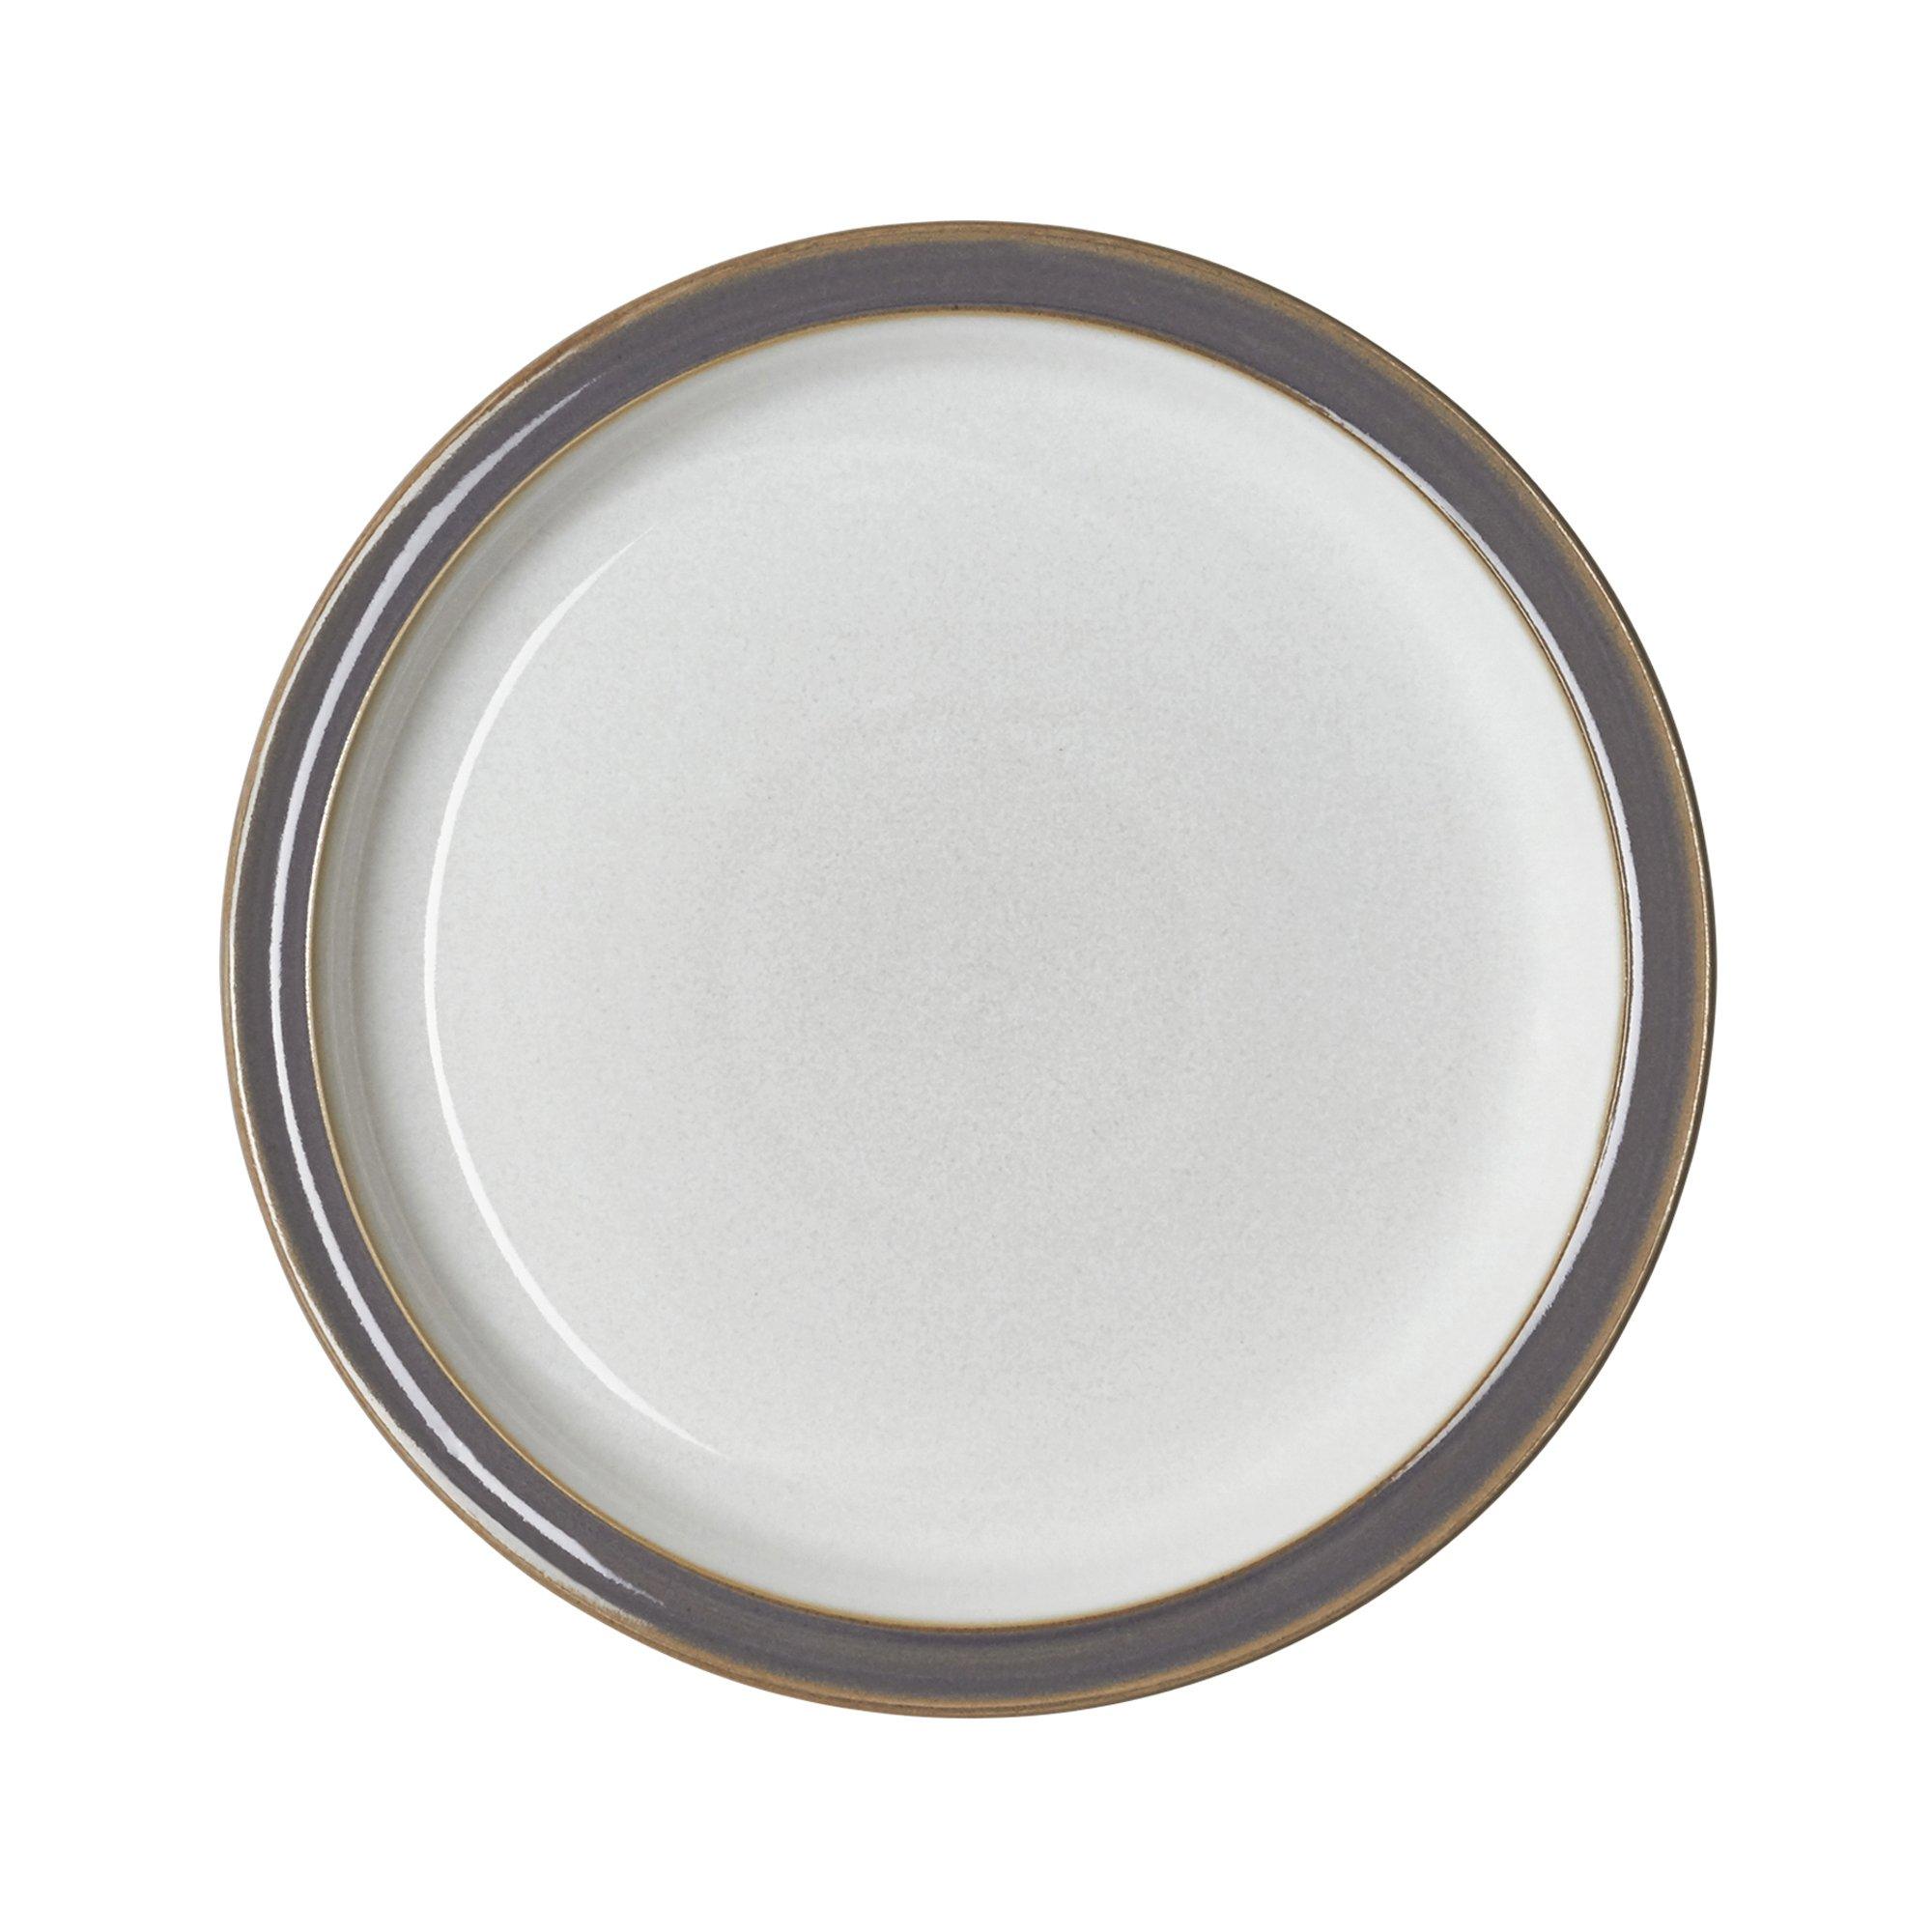 Denby USA Blends Truffle/Canvas Salad Plate, Brown/Cream